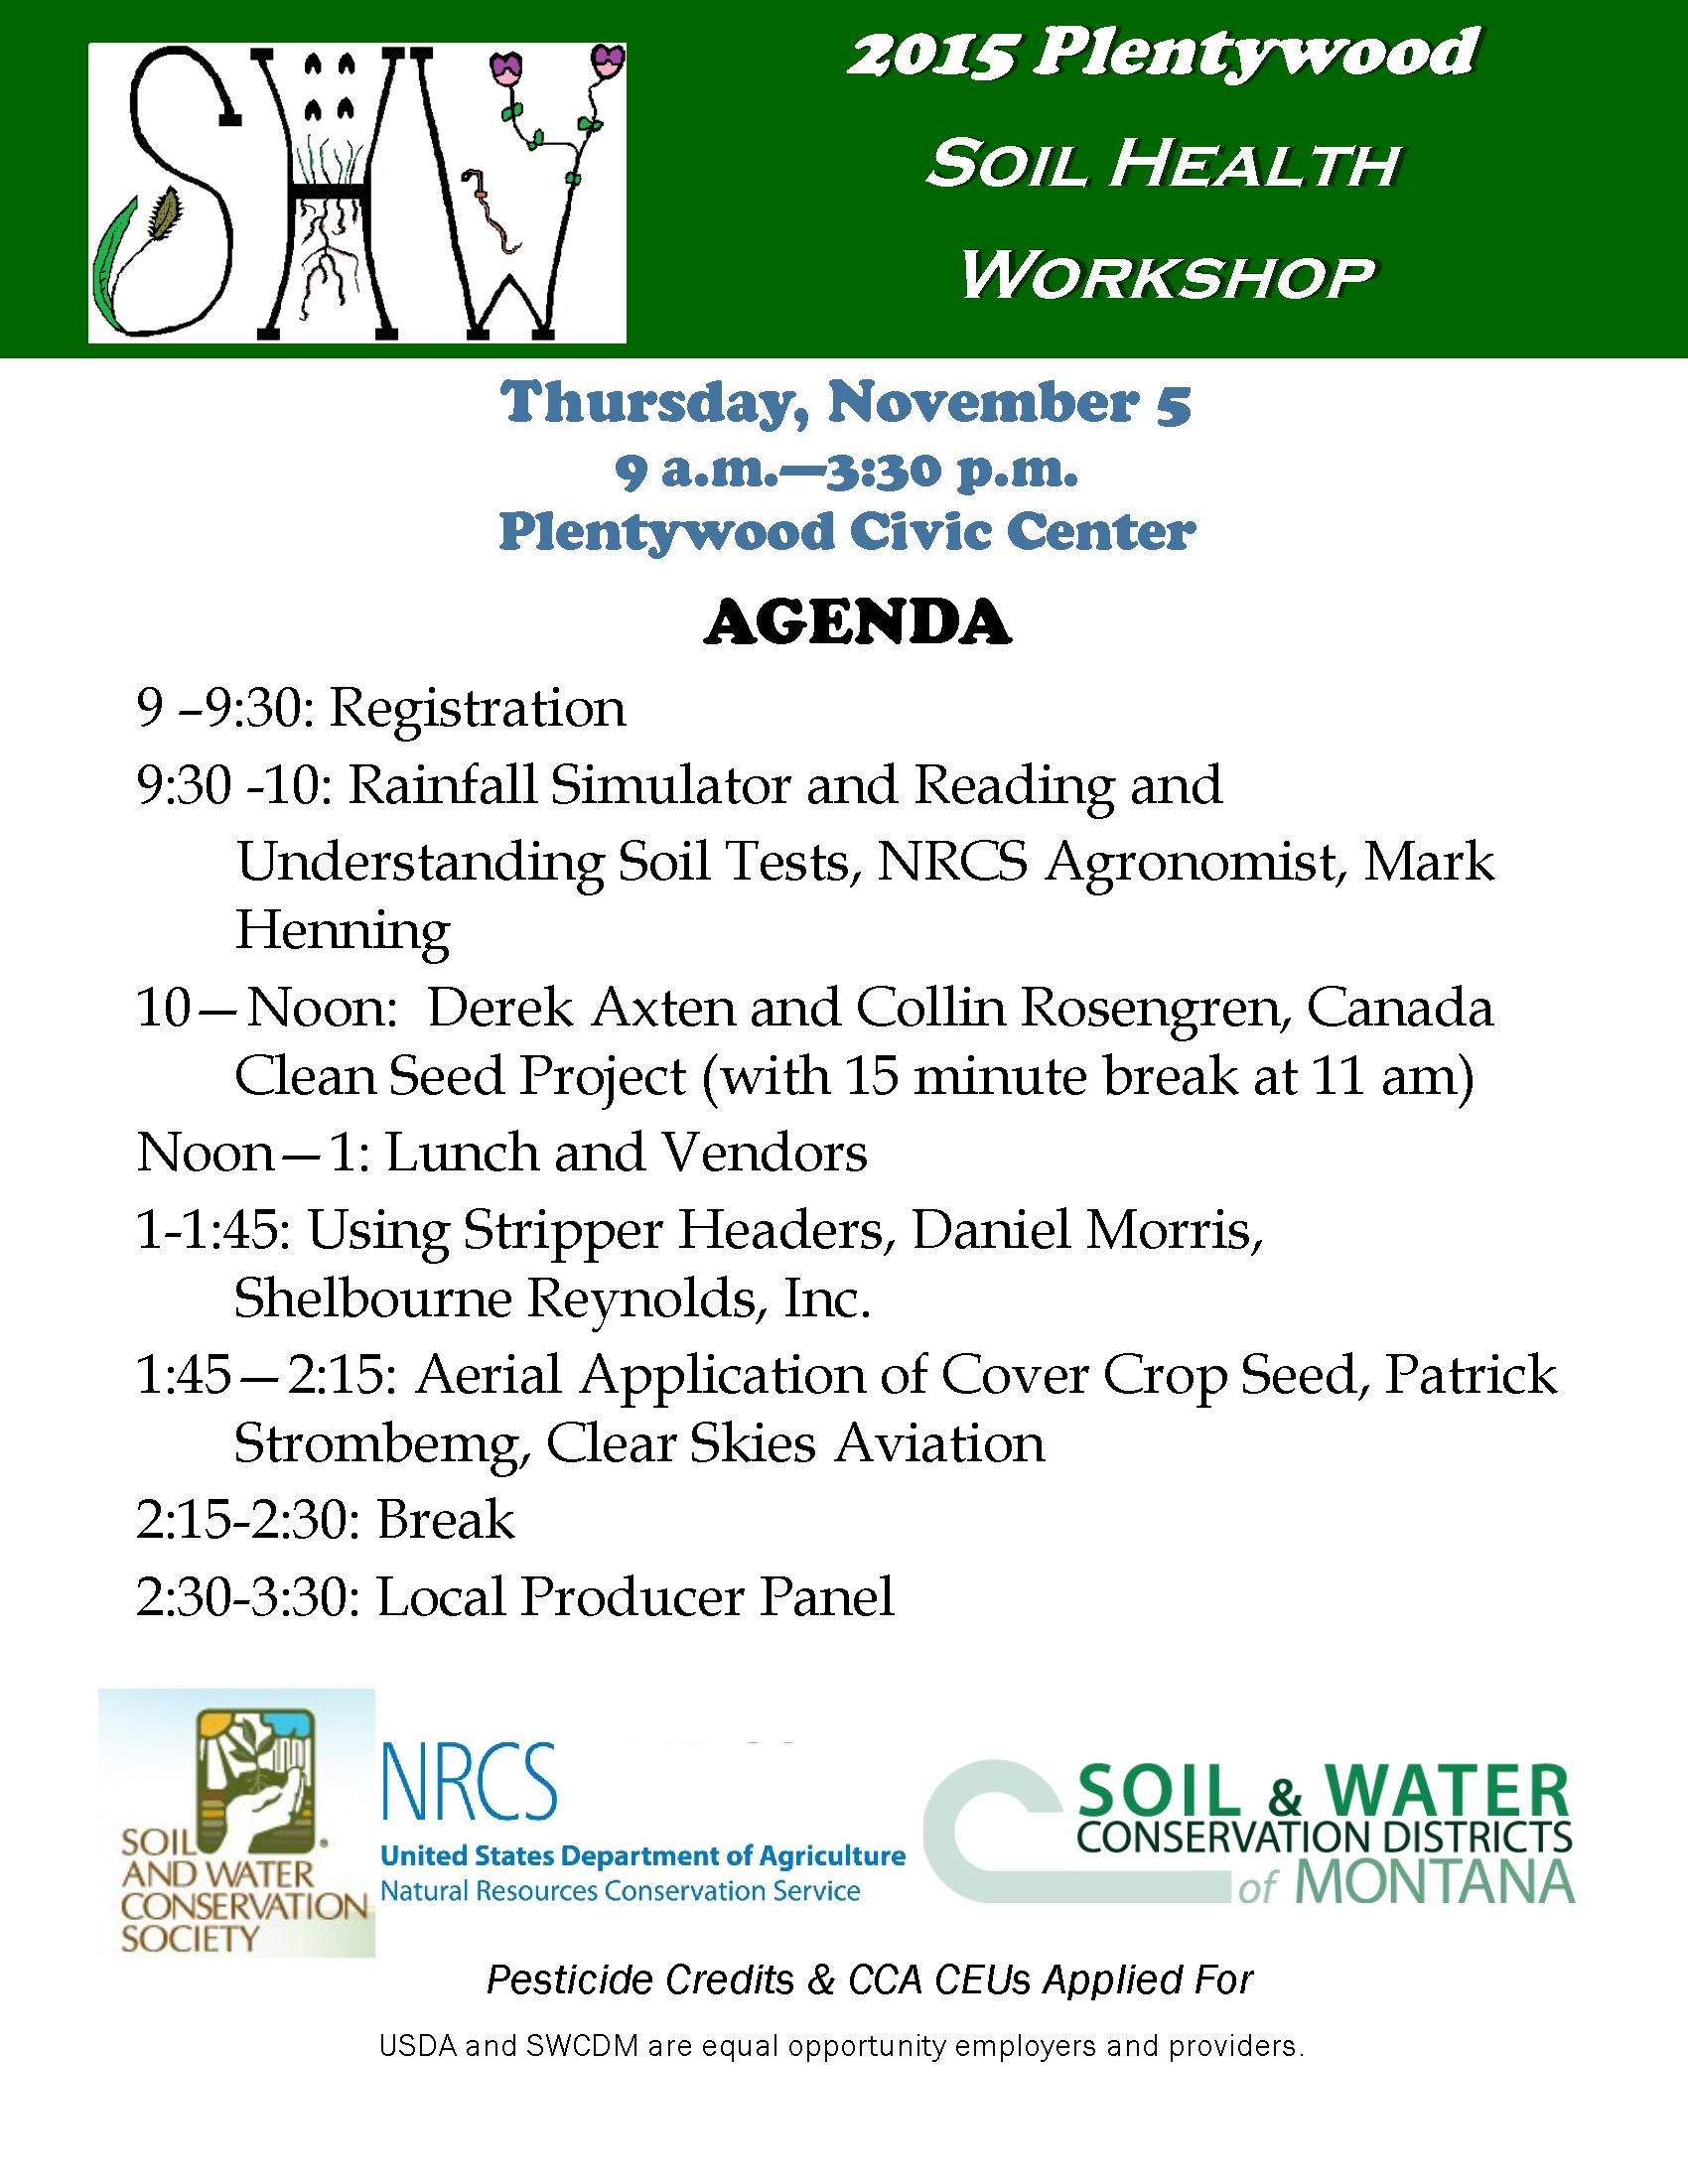 Montana mccone county circle - November 5 Plentywood Soil Health Workshop